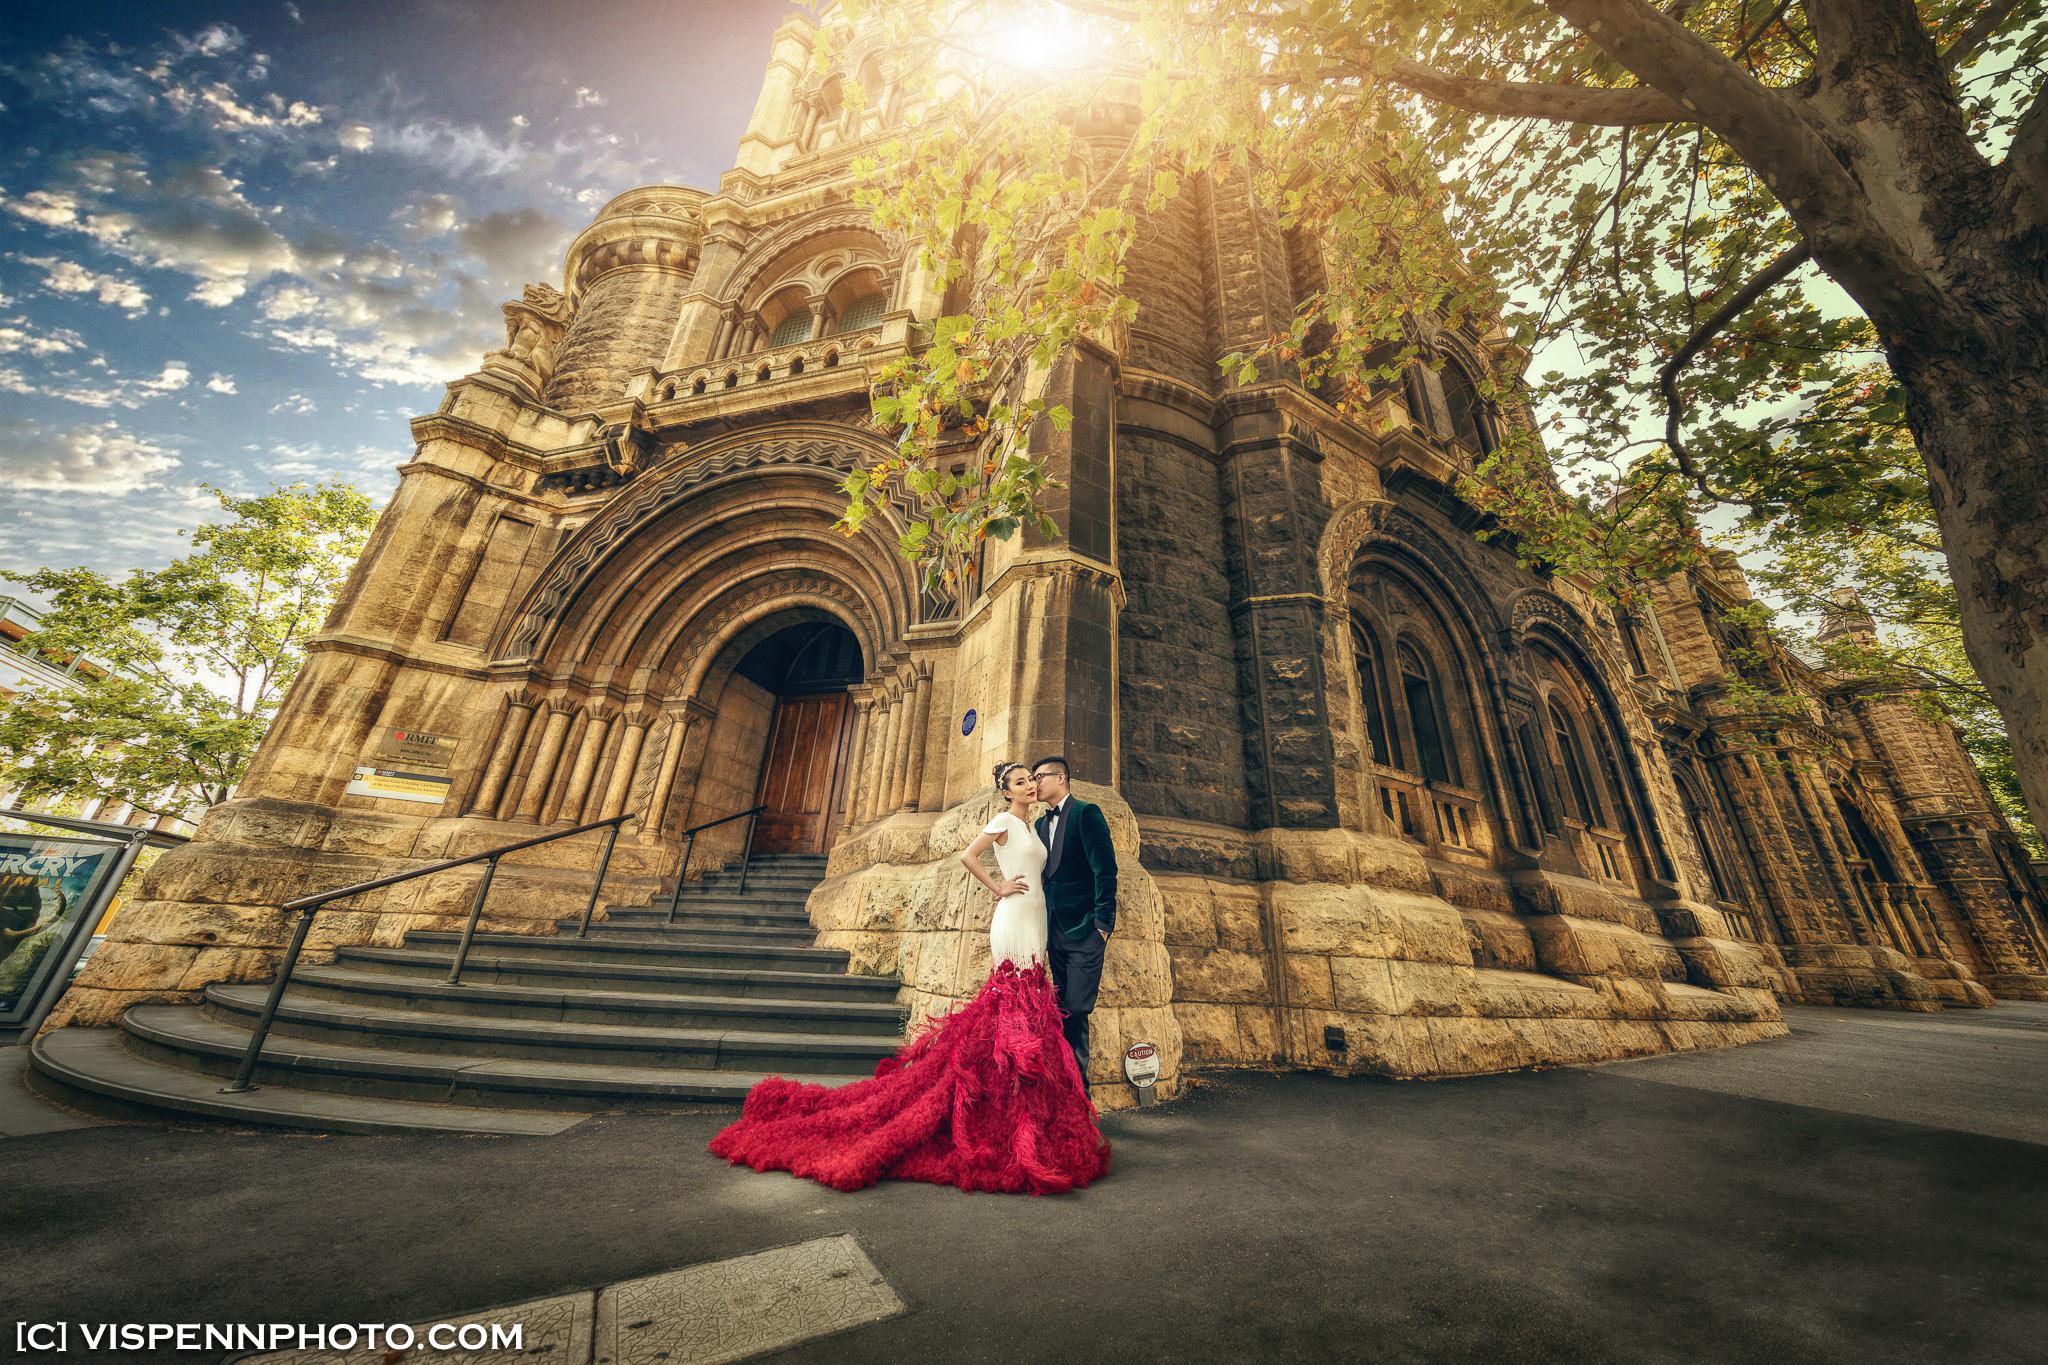 PRE WEDDING Photography Melbourne VISPENN 墨尔本 婚纱照 结婚照 婚纱摄影 VISPENN StacieYi PreWedding 5843 1